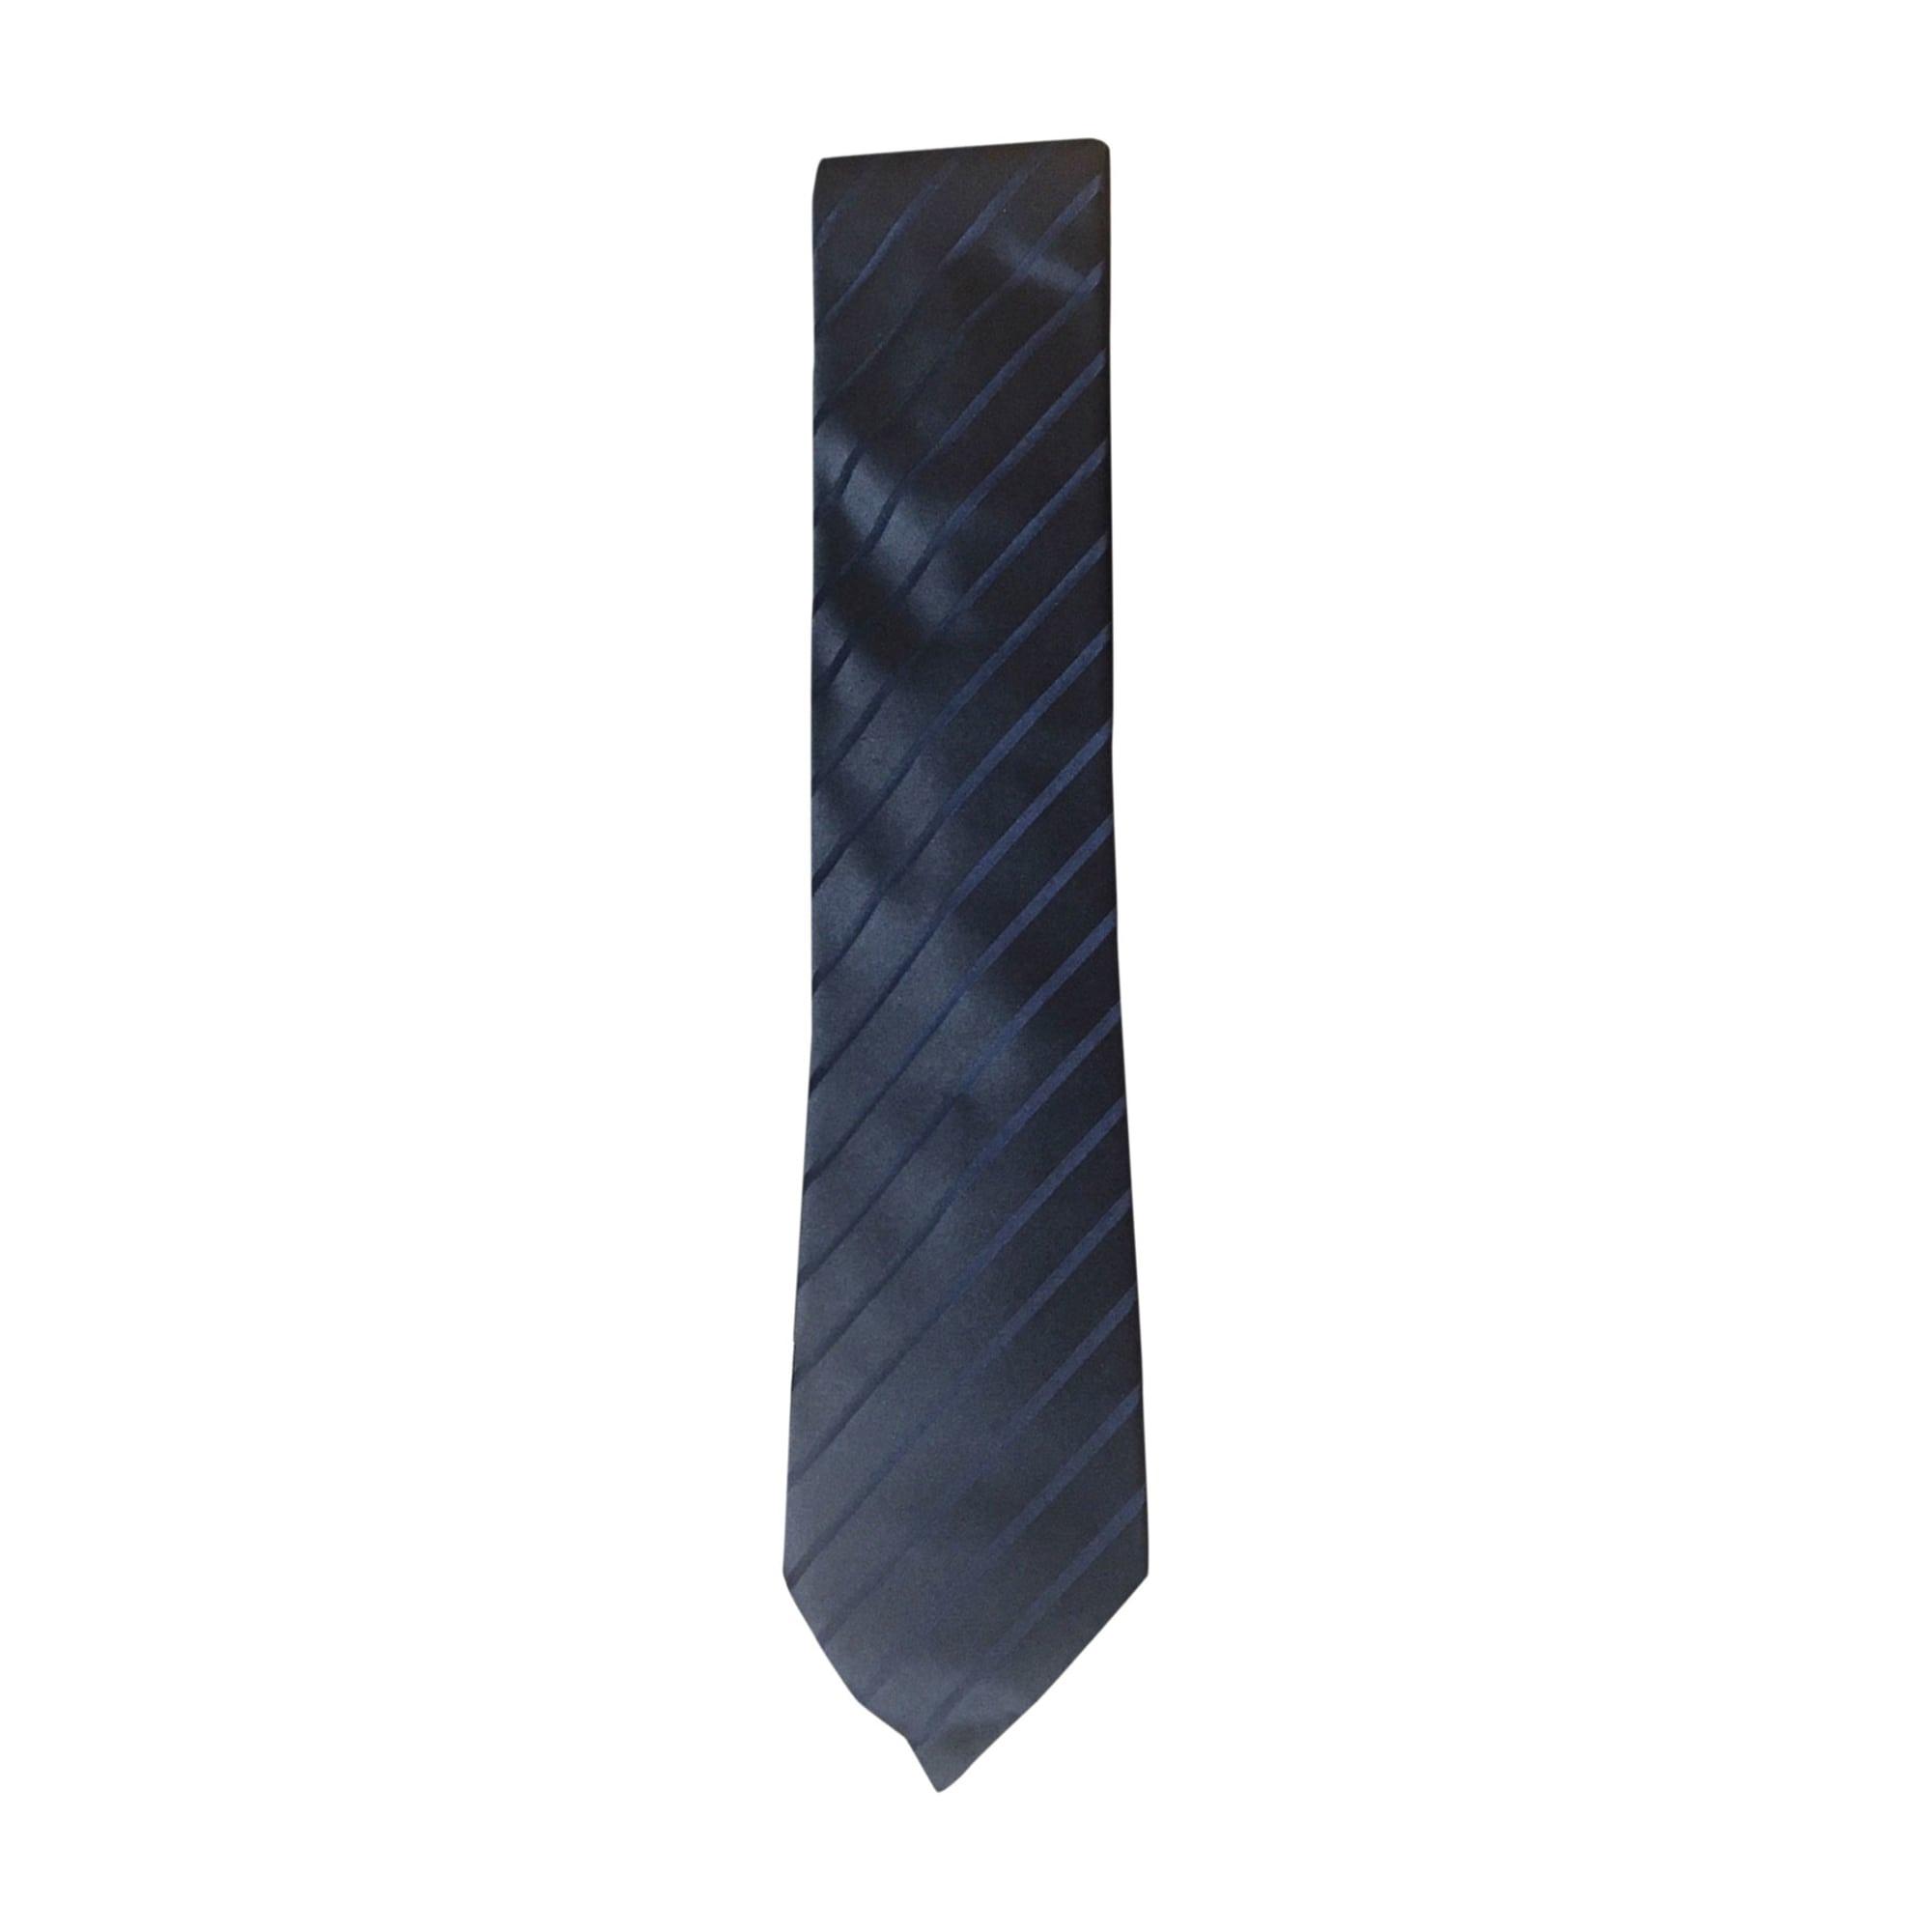 Tie PIAGET Black